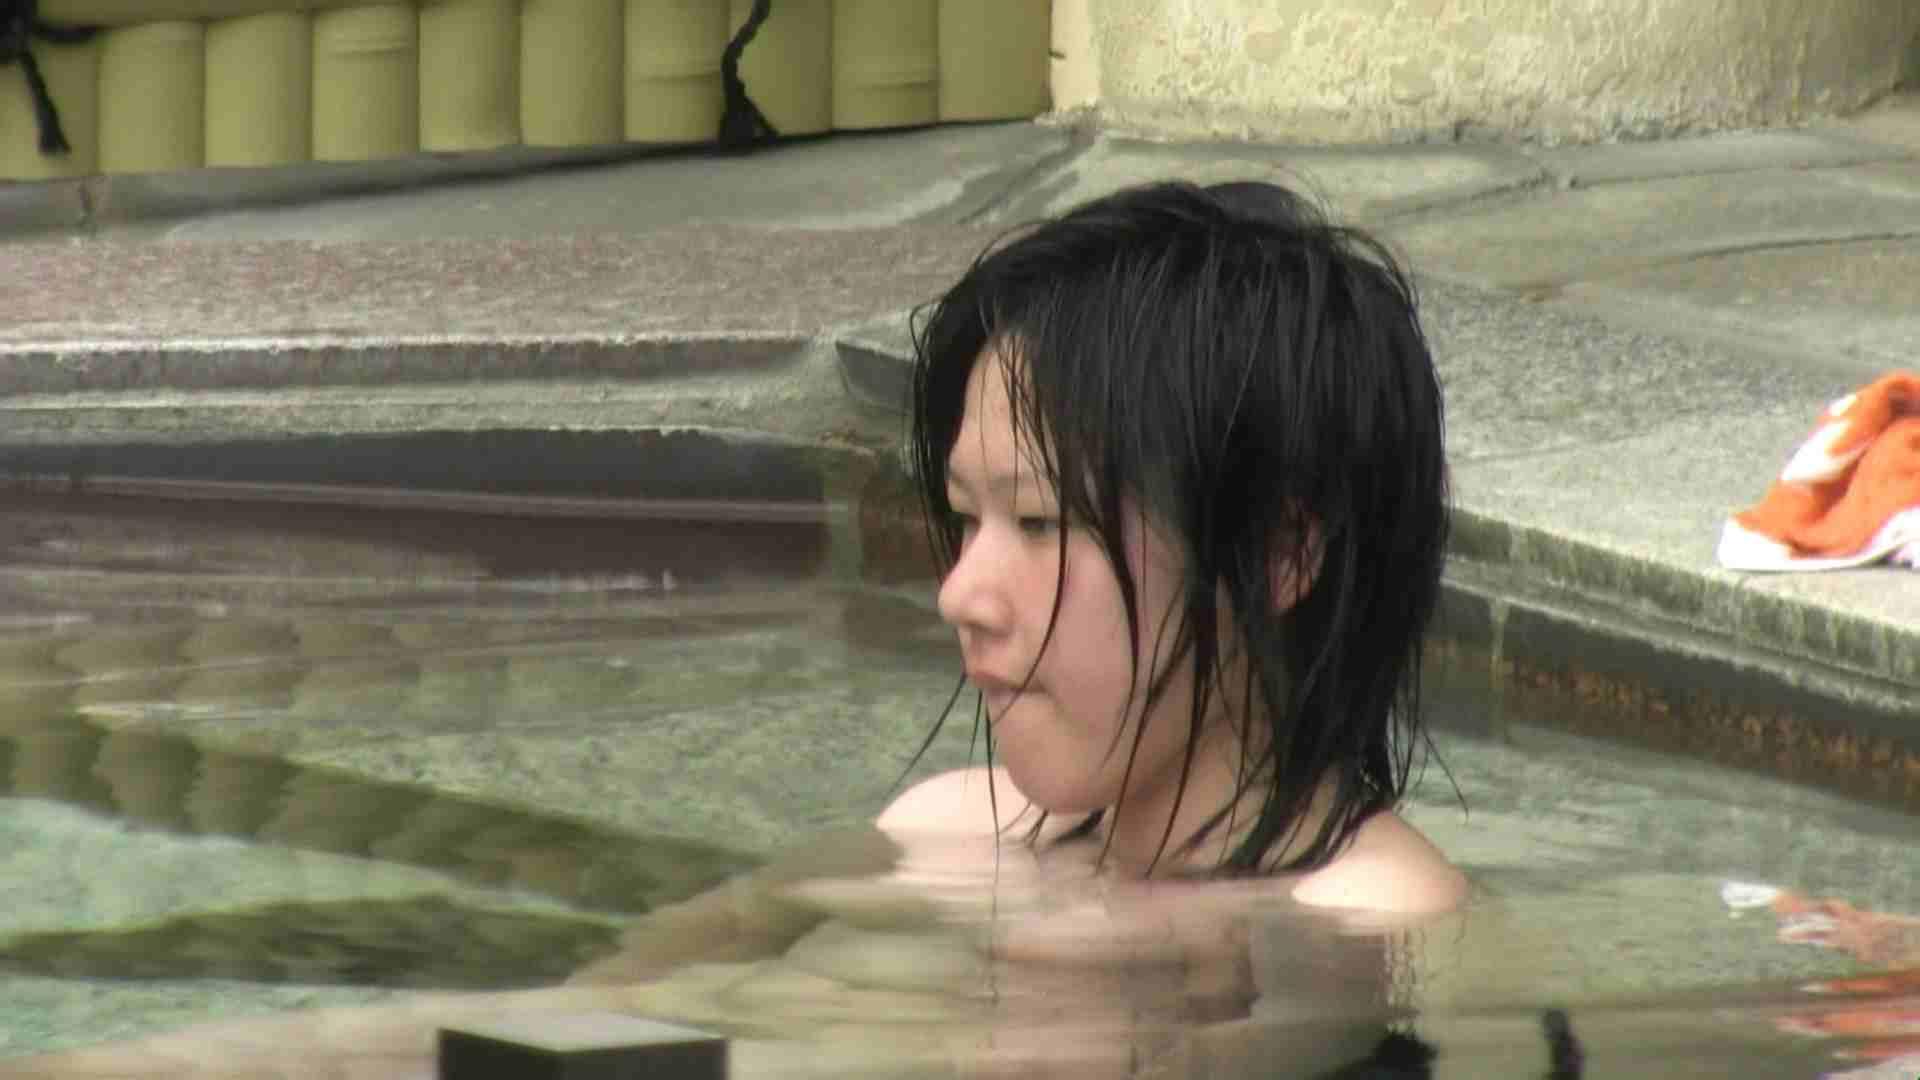 Aquaな露天風呂Vol.36 露天 のぞき動画画像 78連発 41